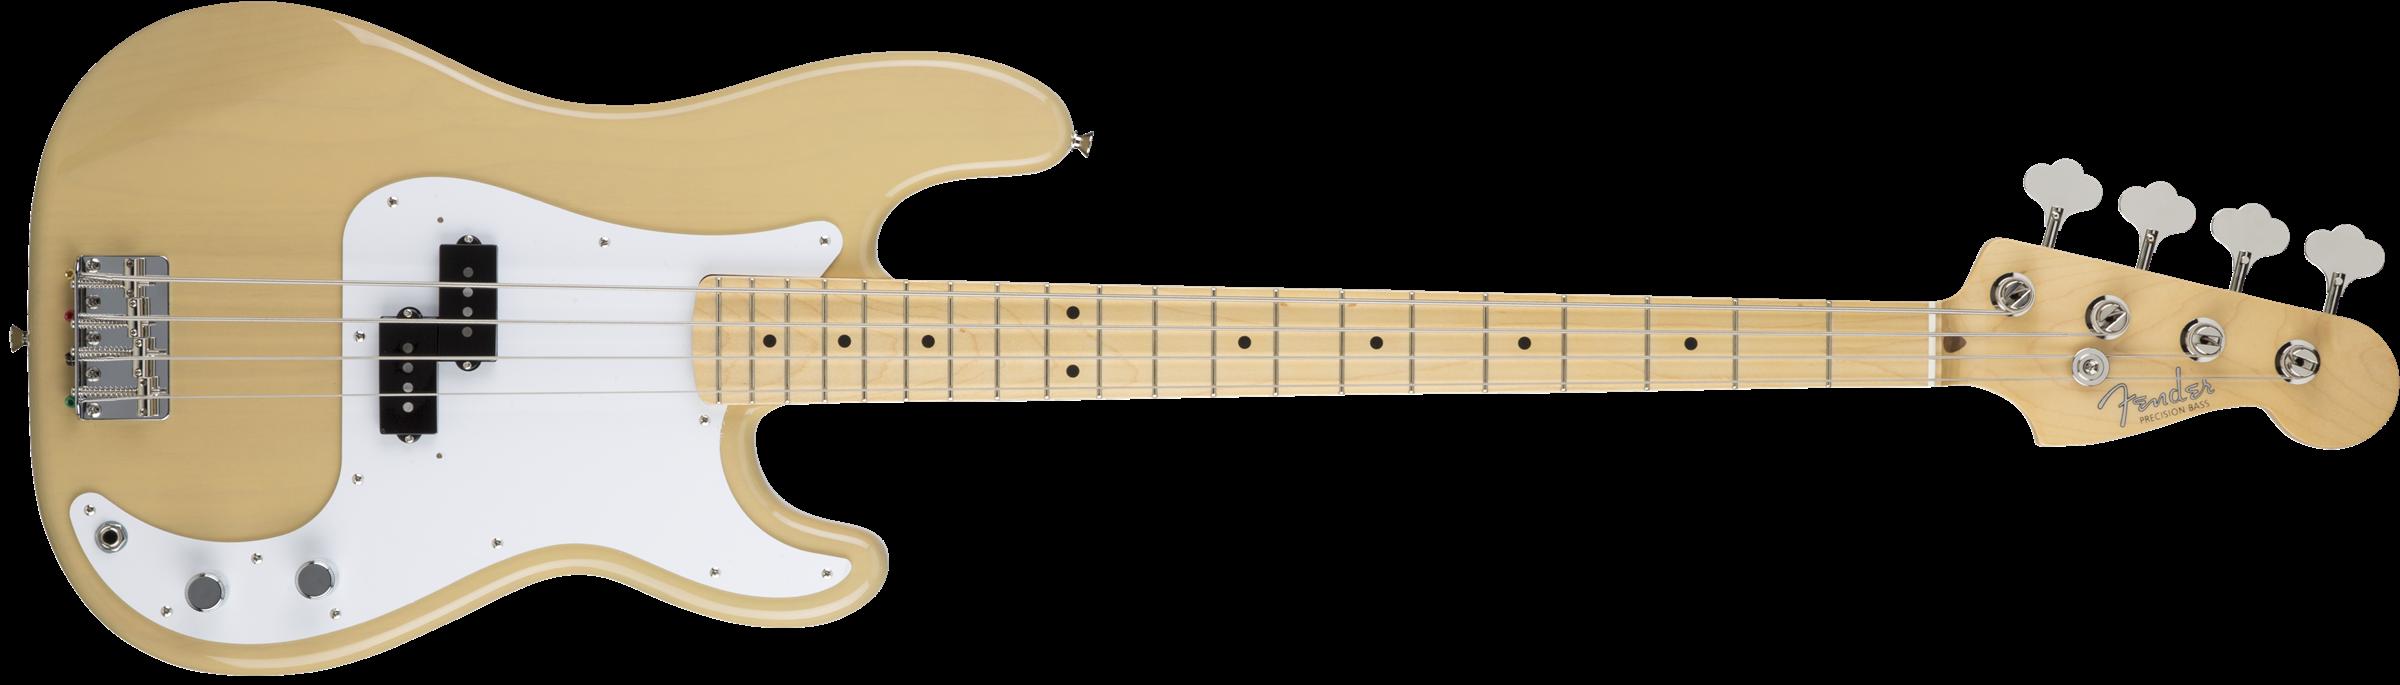 Fender MIJ Hybrid '50s Precision Bass, Maple Fingerboard, Off White Blonde